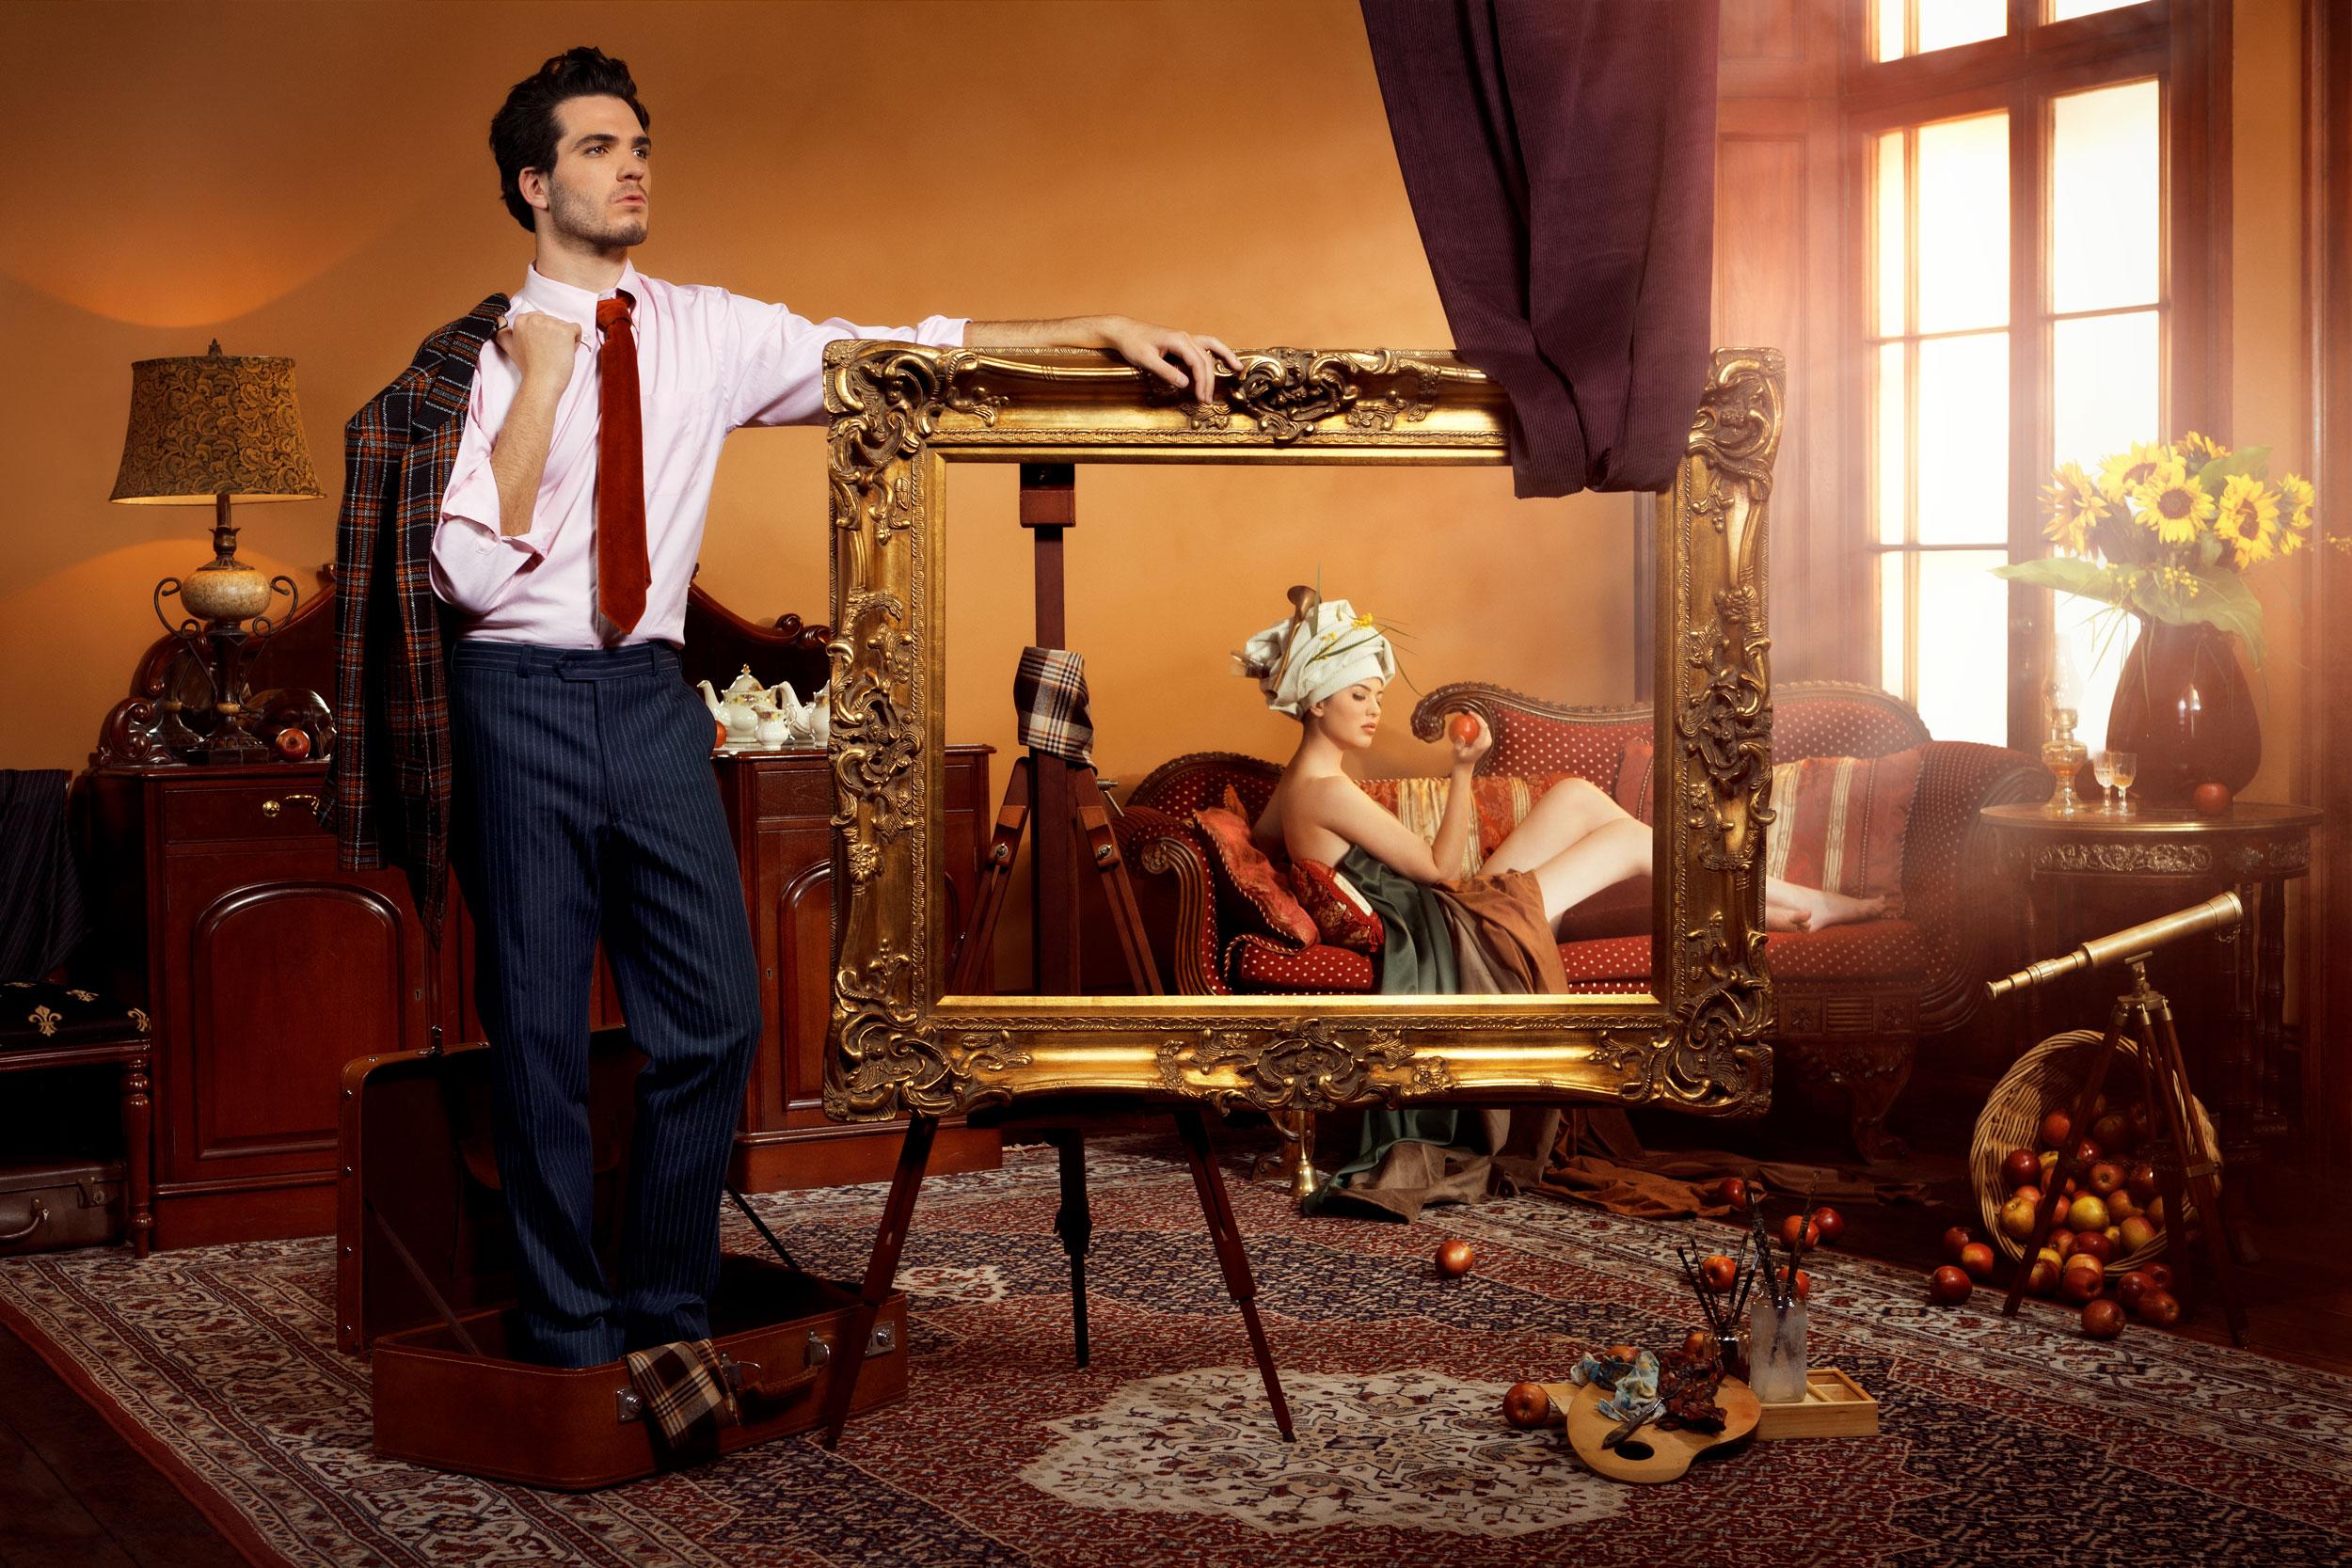 Man in a Suitcase: Artist